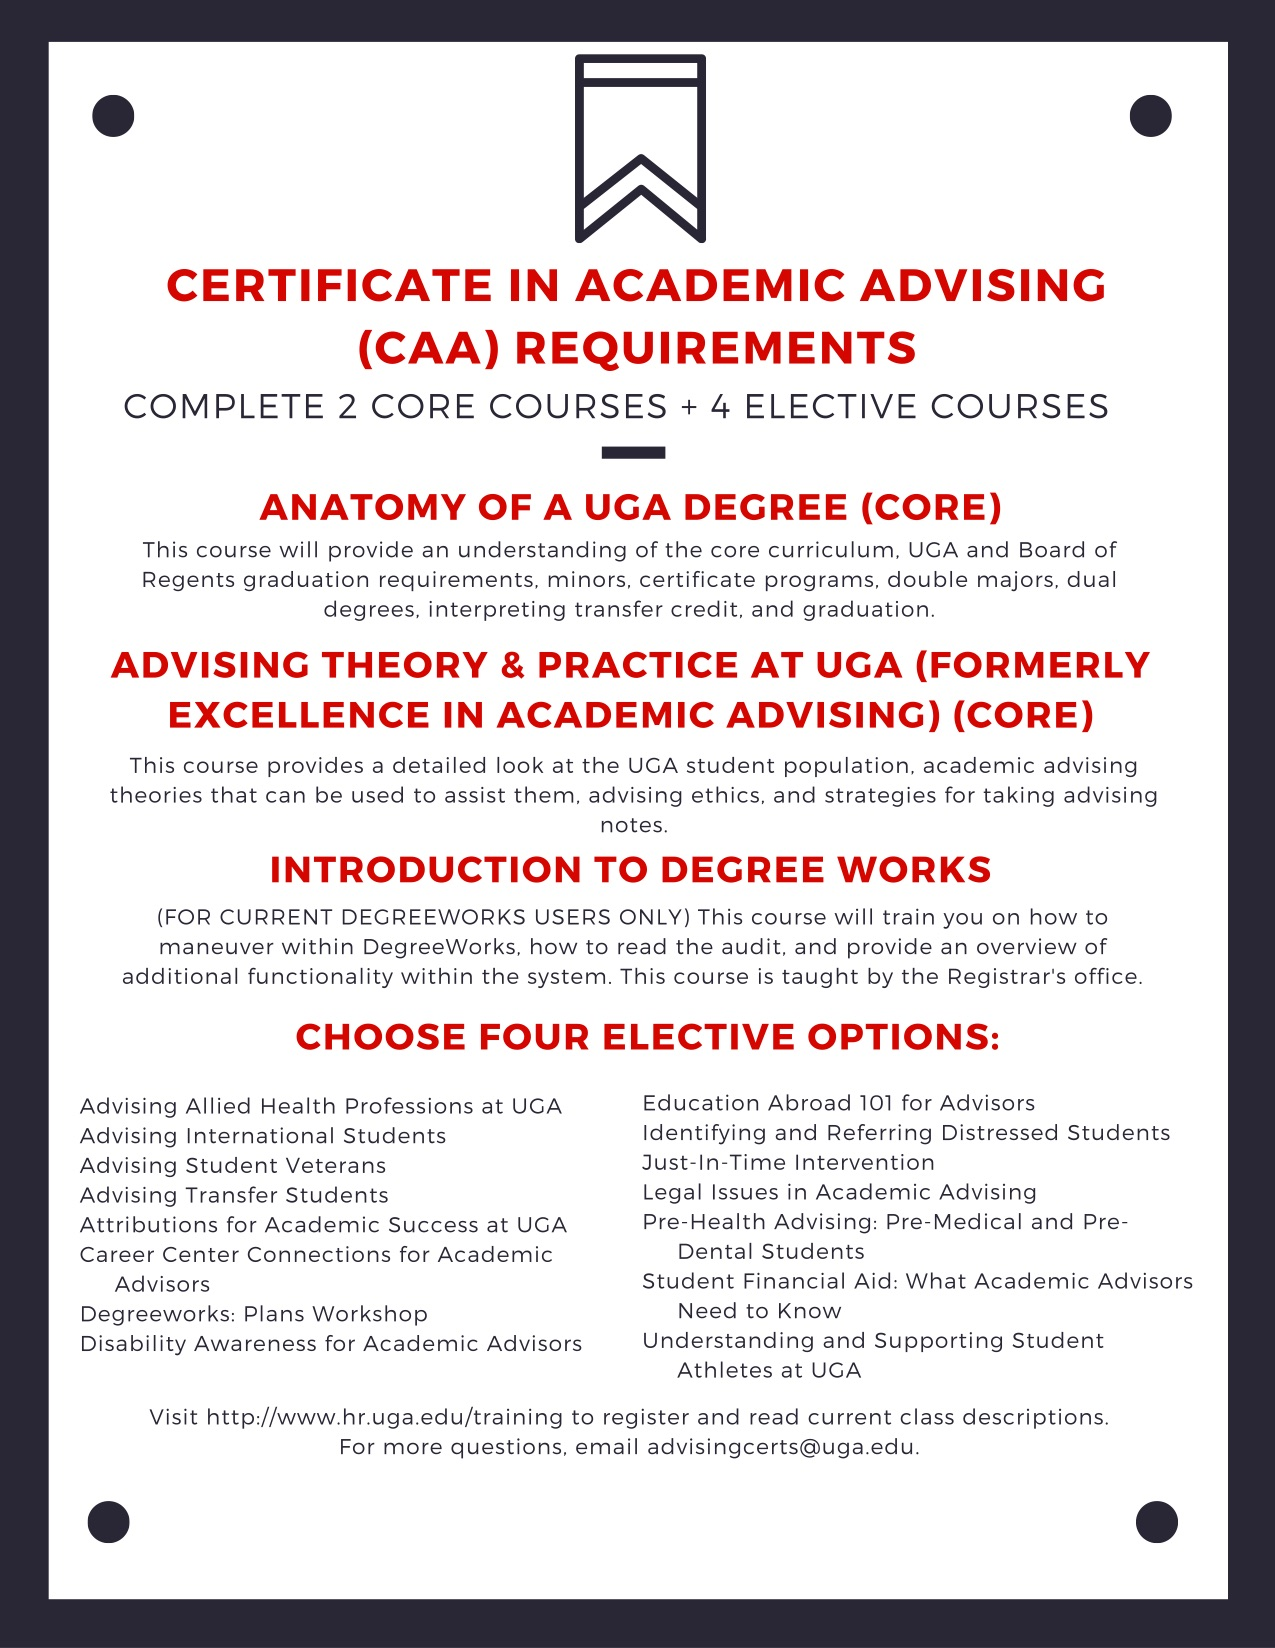 Certificate In Academic Advising Certificates For Advisors Home